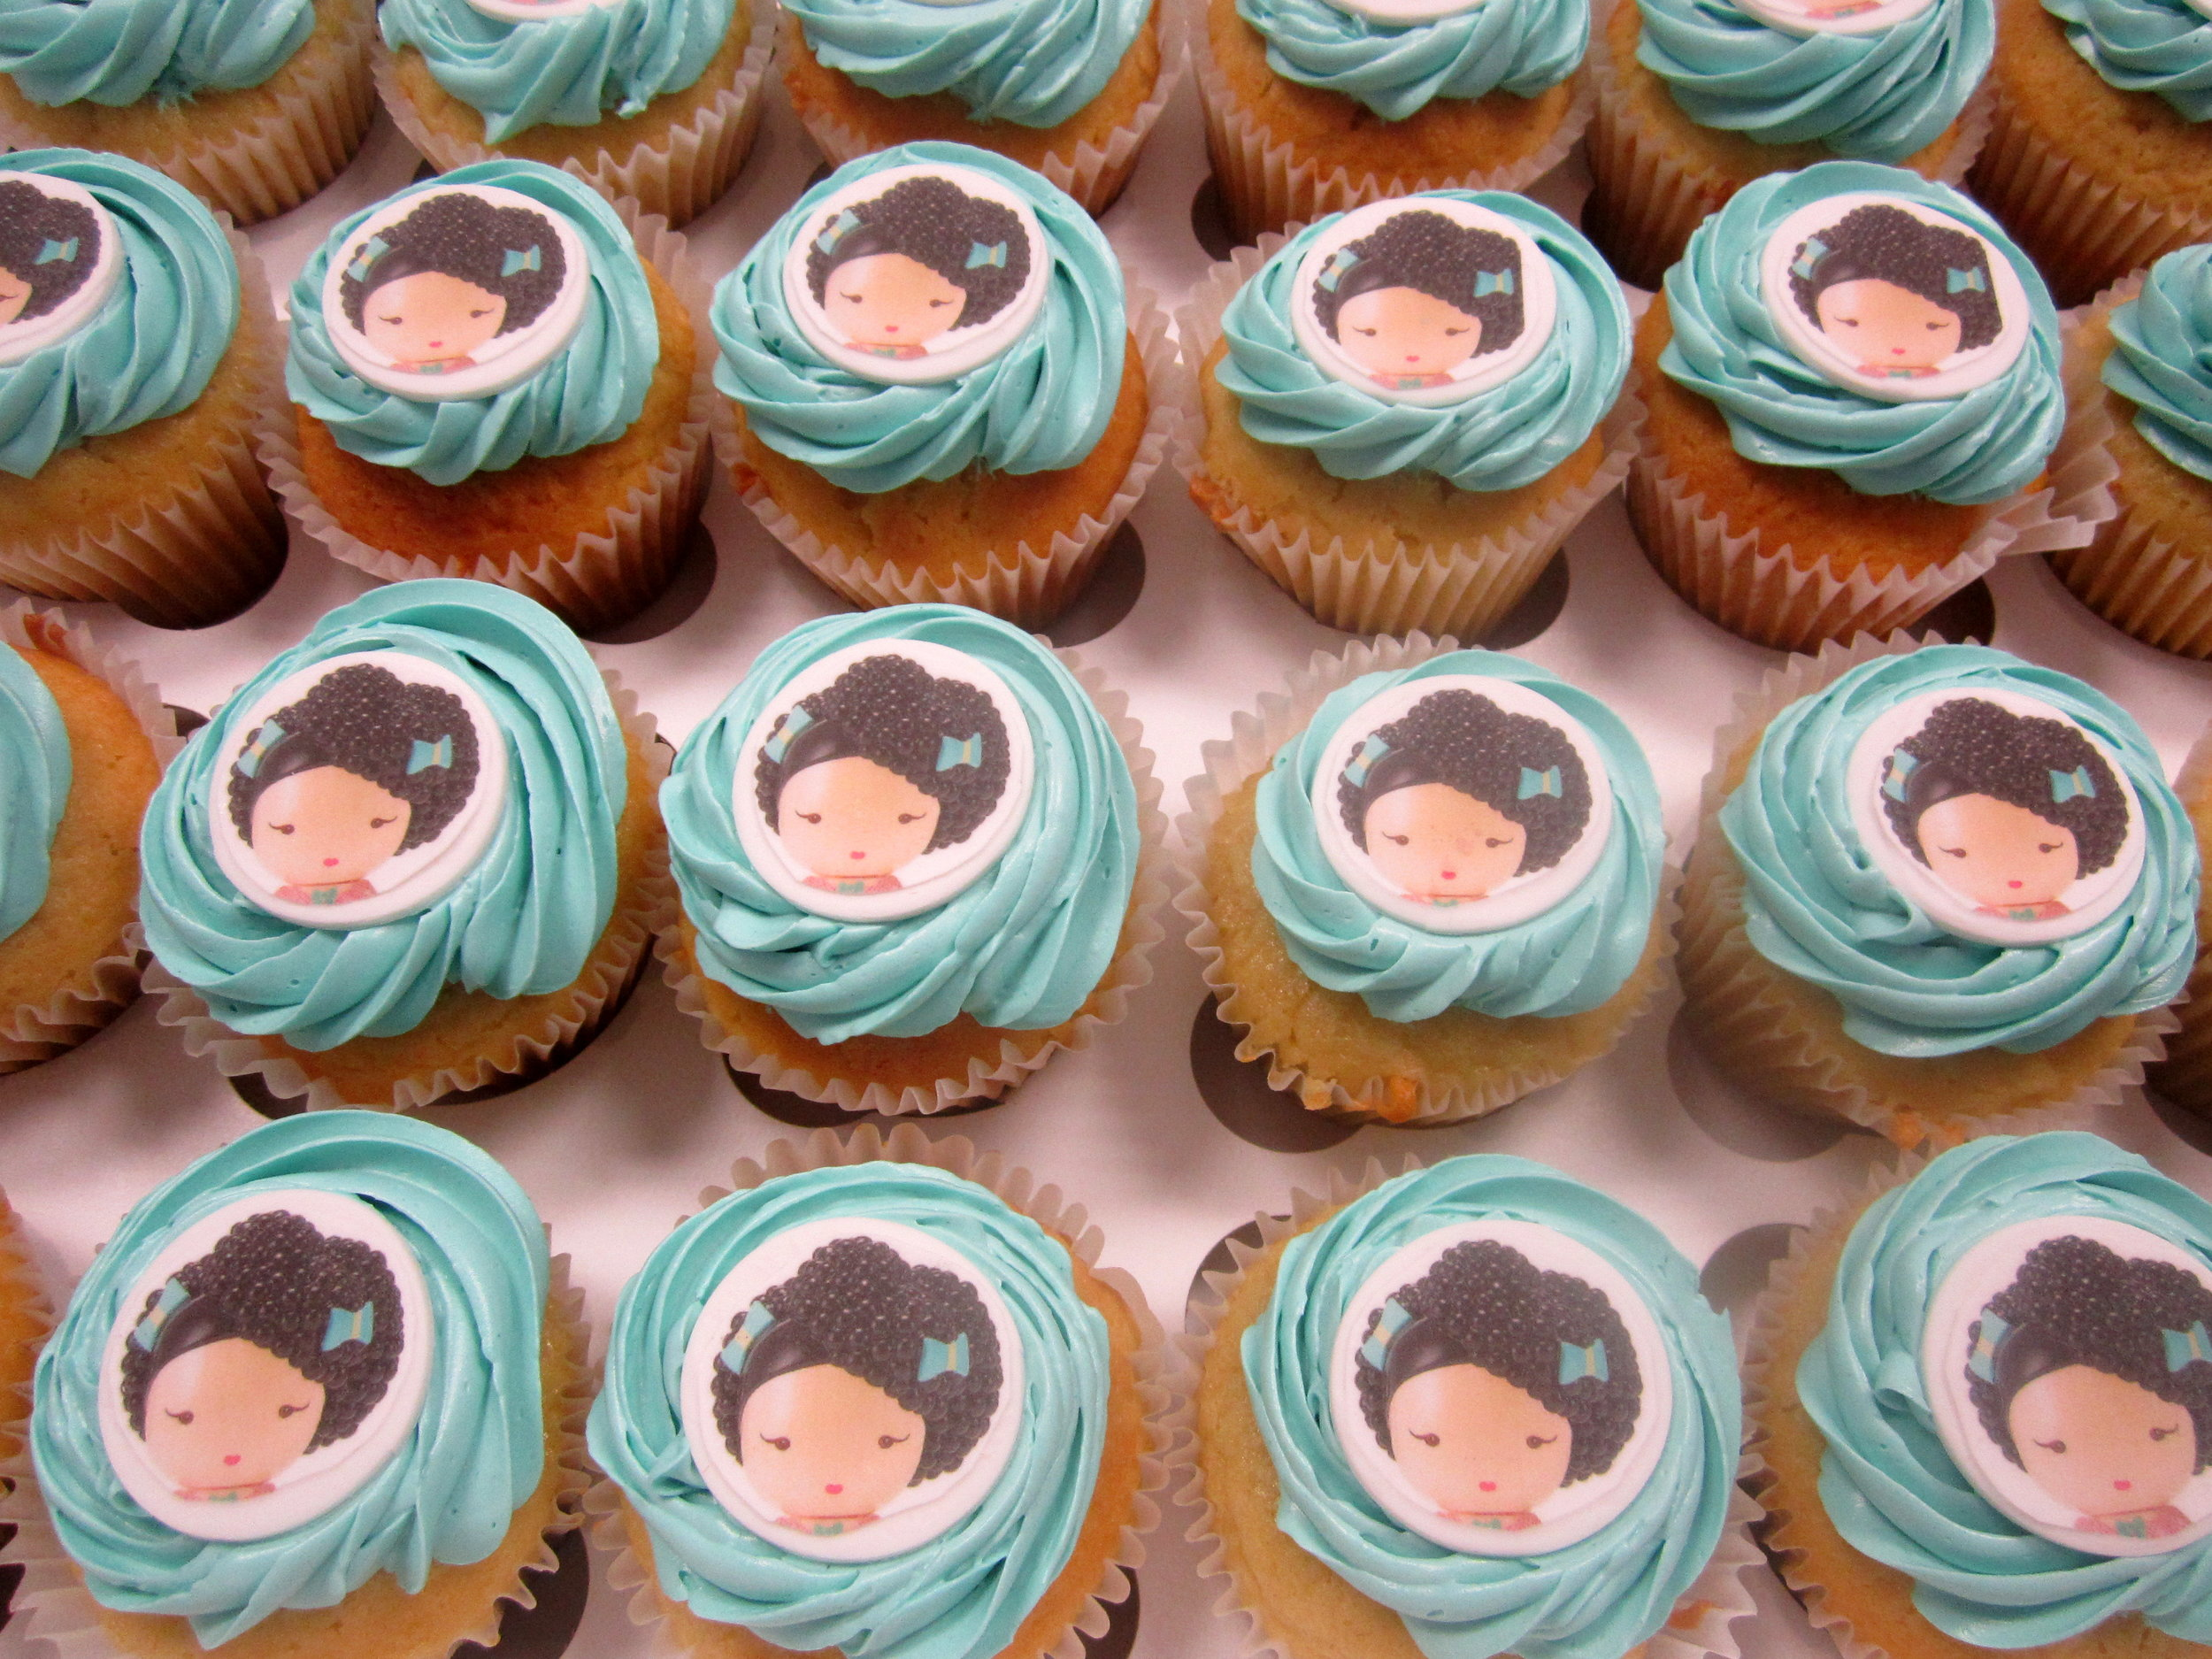 cupcakes-gwen stefani.jpg